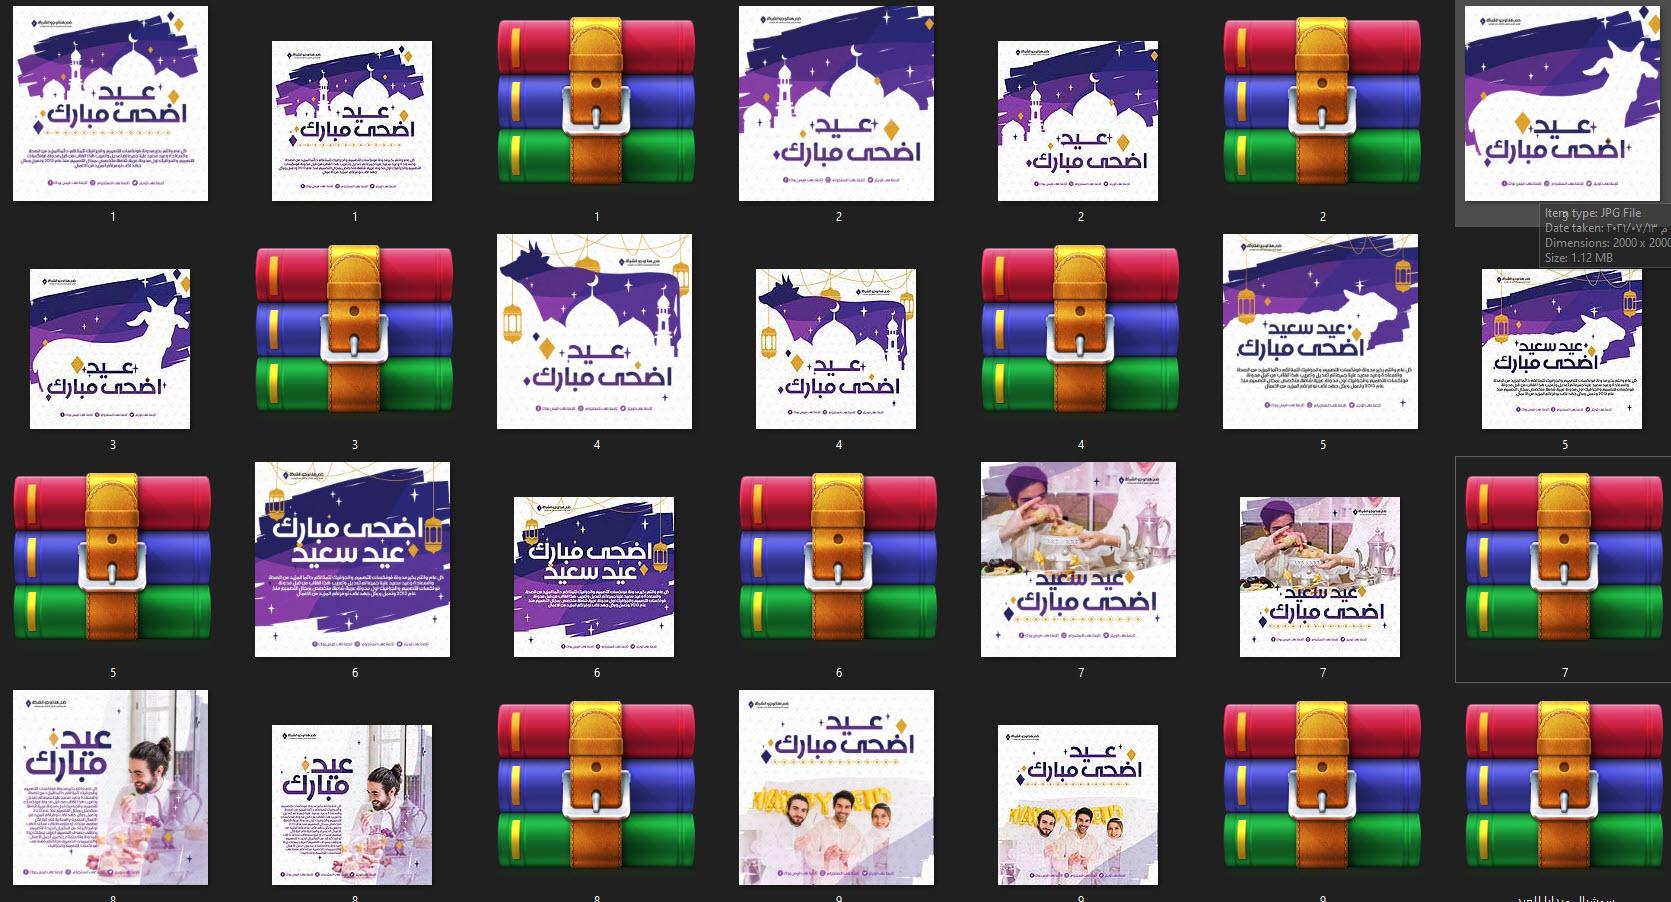 Download social media designs for Eid Al-Adha and Eid congratulations